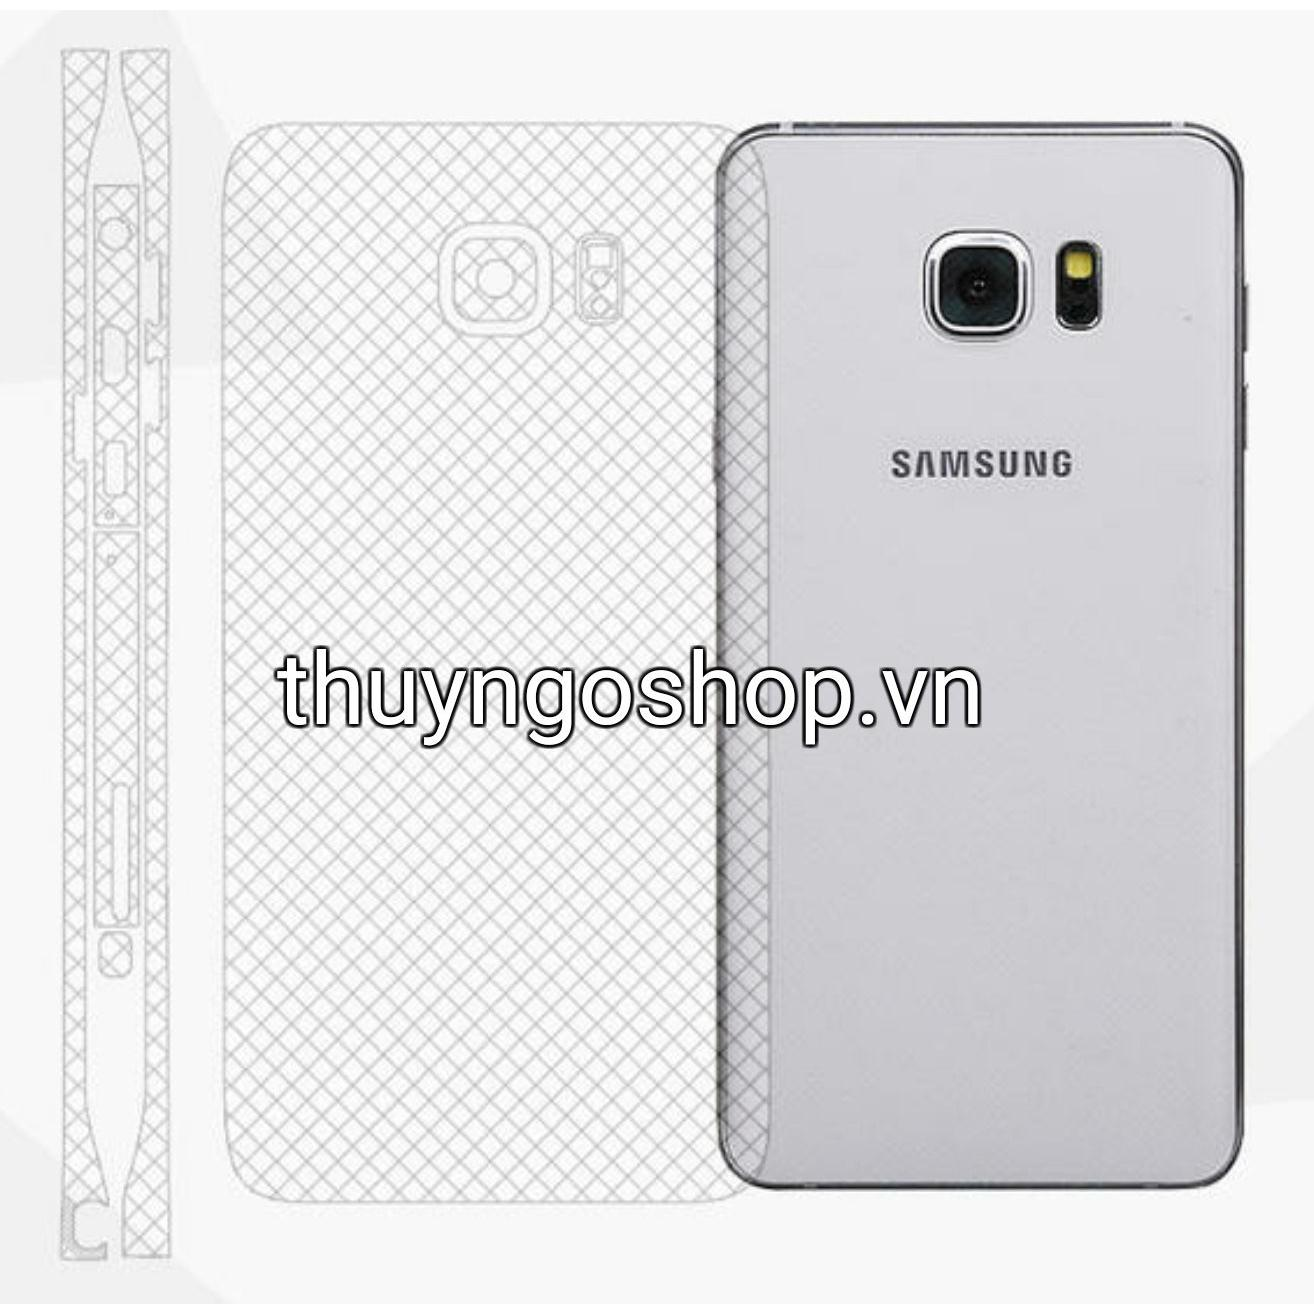 Bộ dán full body Samsung Galaxy S6 Egde